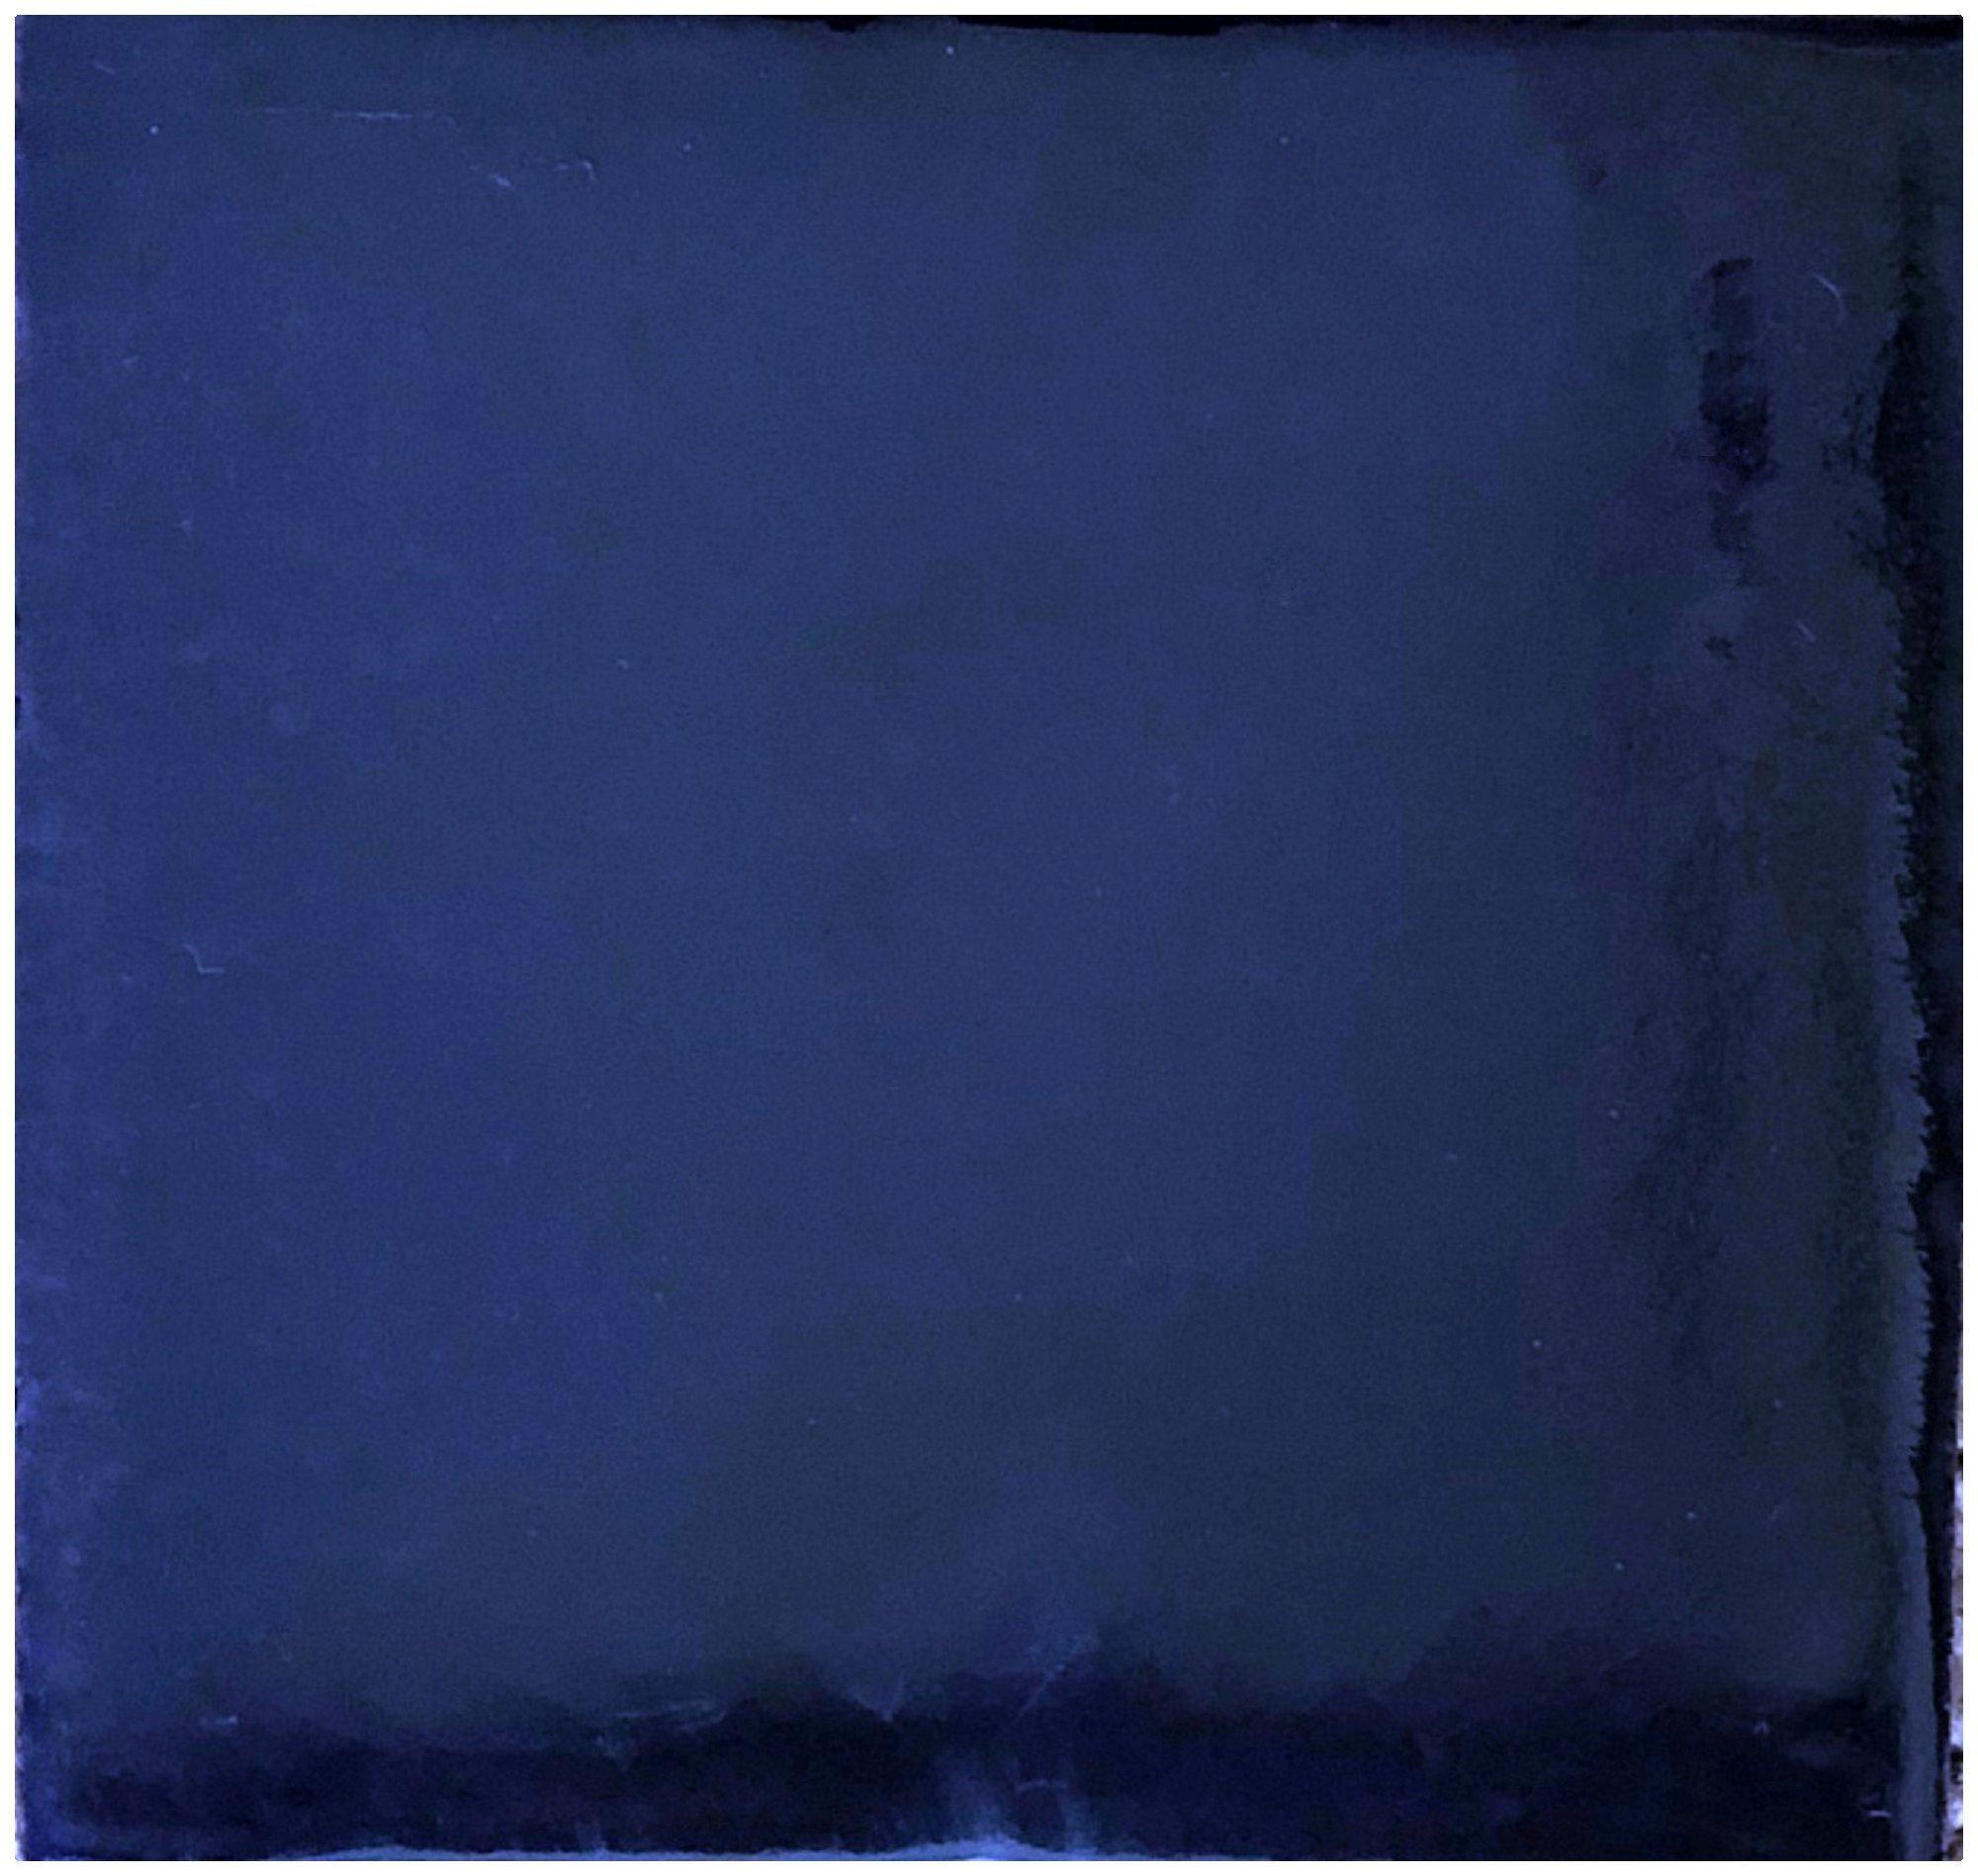 Rustico Tile and Stone TR4COBALT Cobalt Blue Painted Tile Box of 90 4 x 4'', Navy by Rustico Tile and Stone (Image #1)